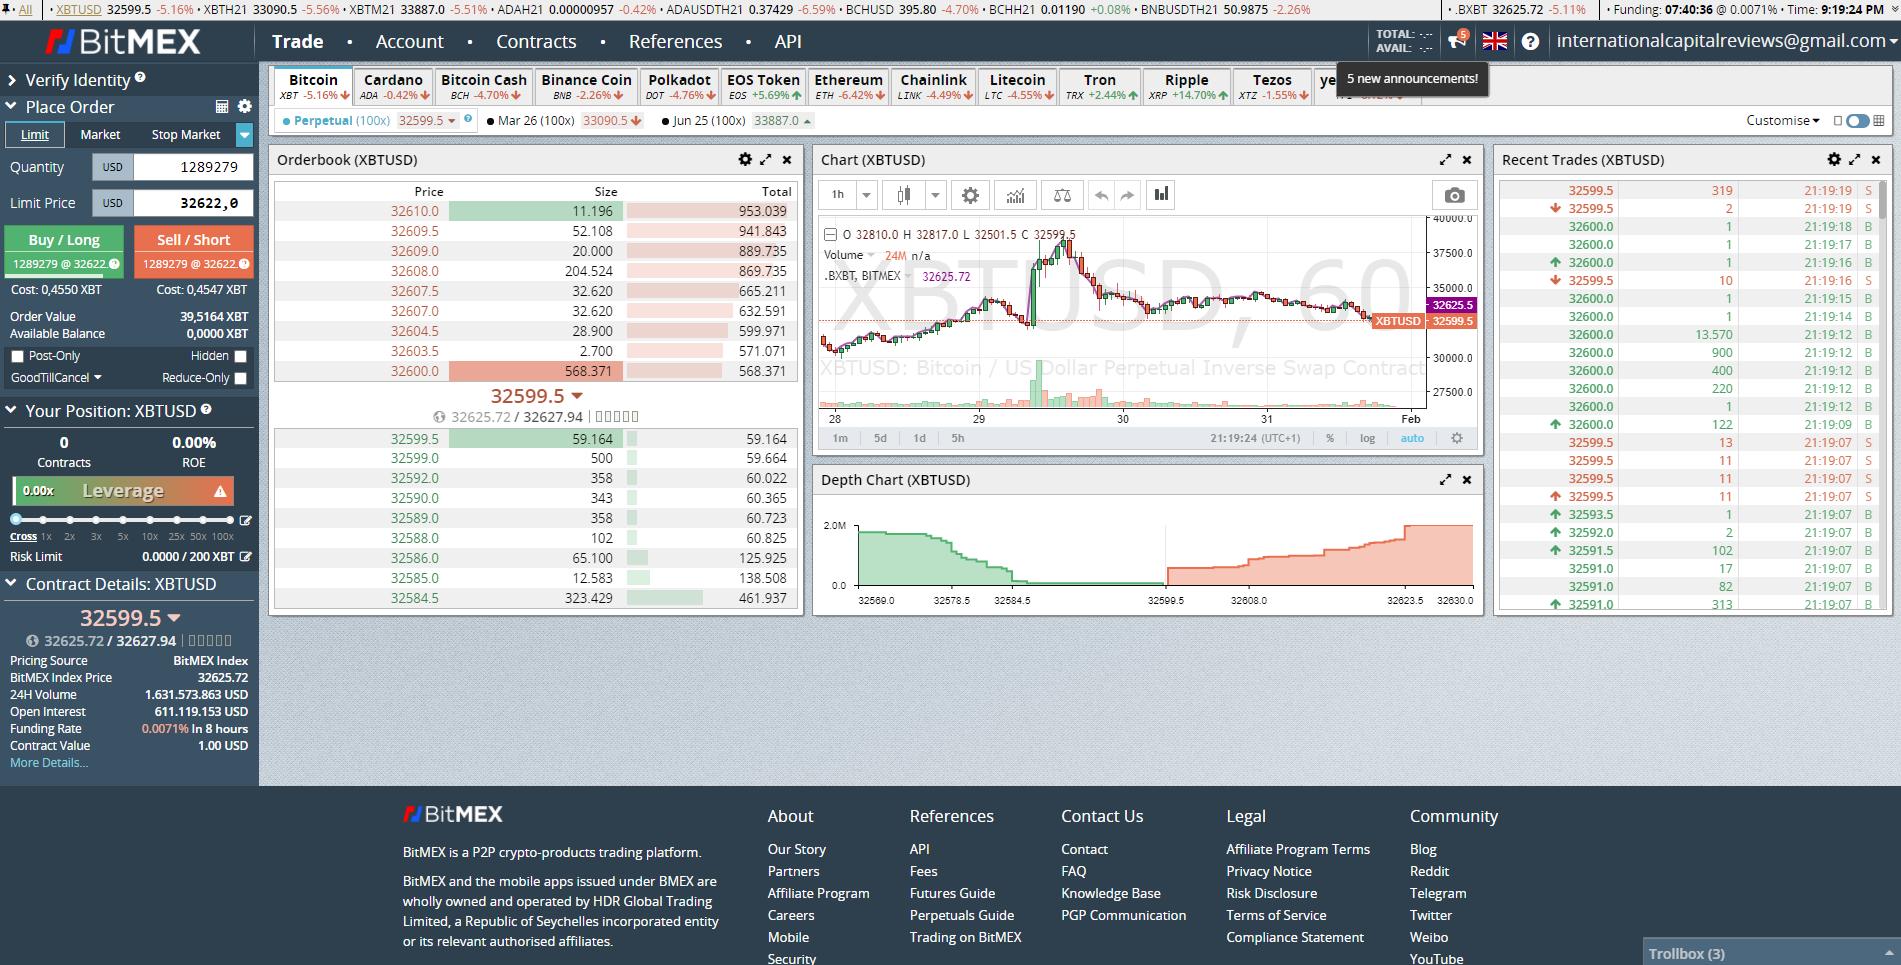 BitMEX handelsplatform